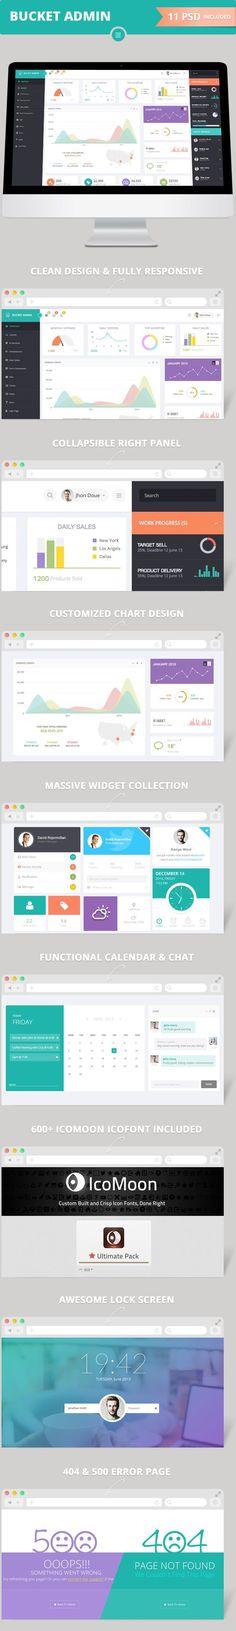 Site Templates - Bucket Admin Bootstrap 3 Responsive Flat Dashboard…